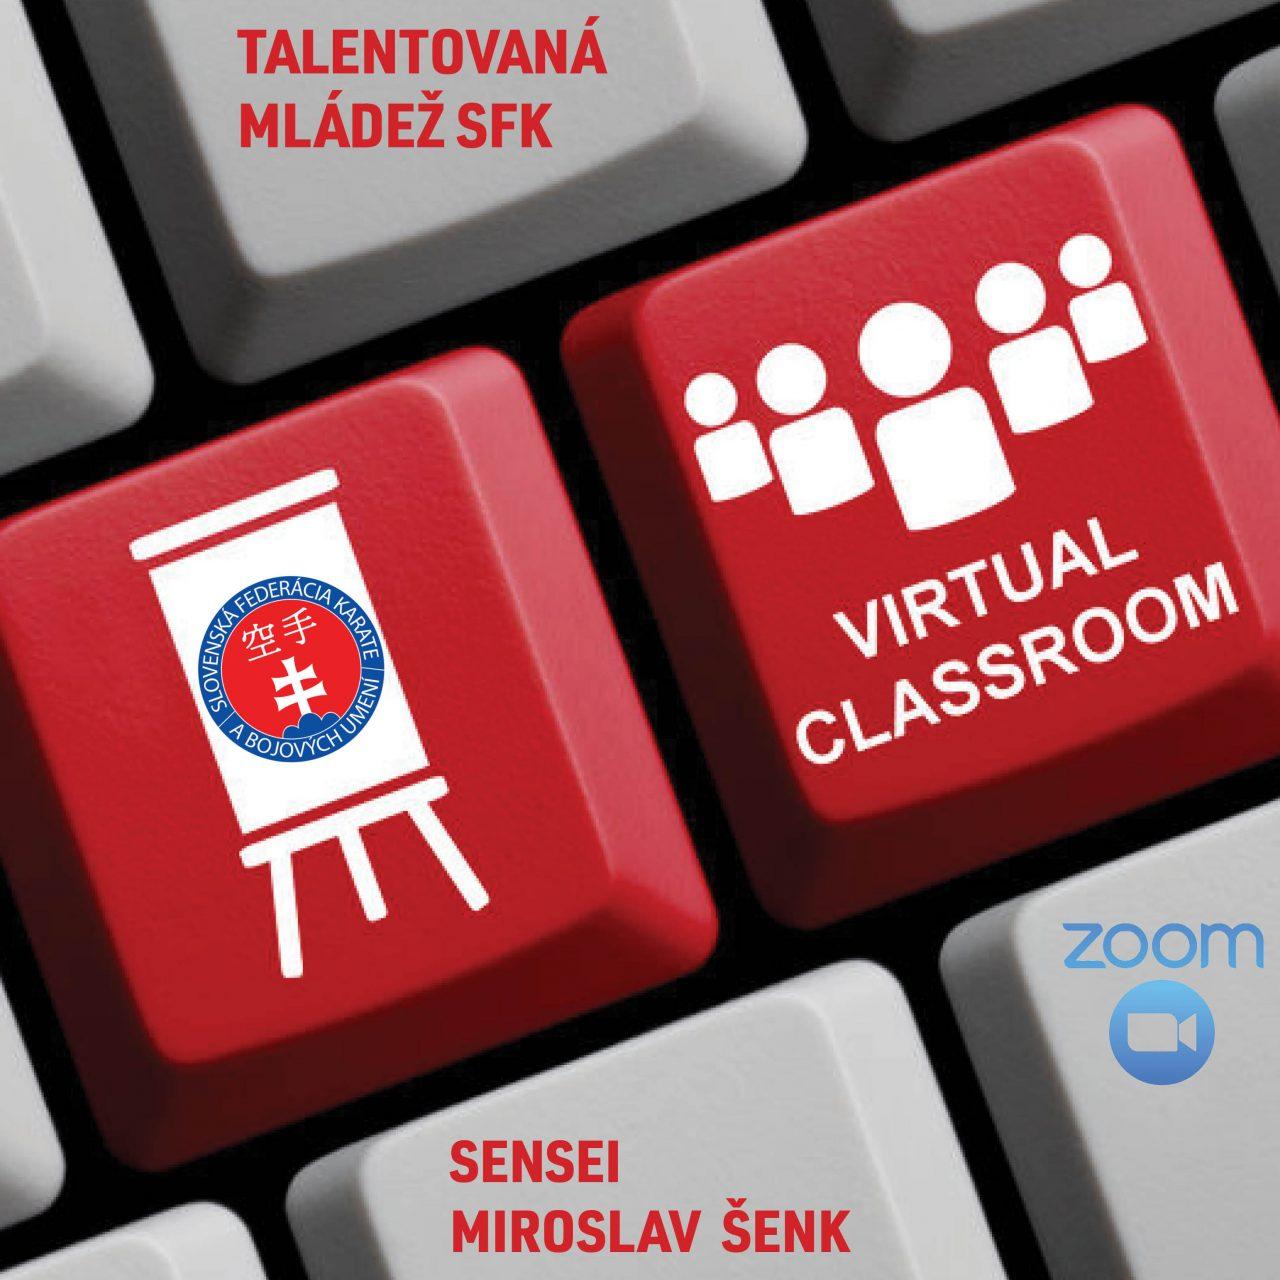 https://karate-slovakia.sk/wp-content/uploads/online-treningy_tm_Senk-1280x1280.jpg